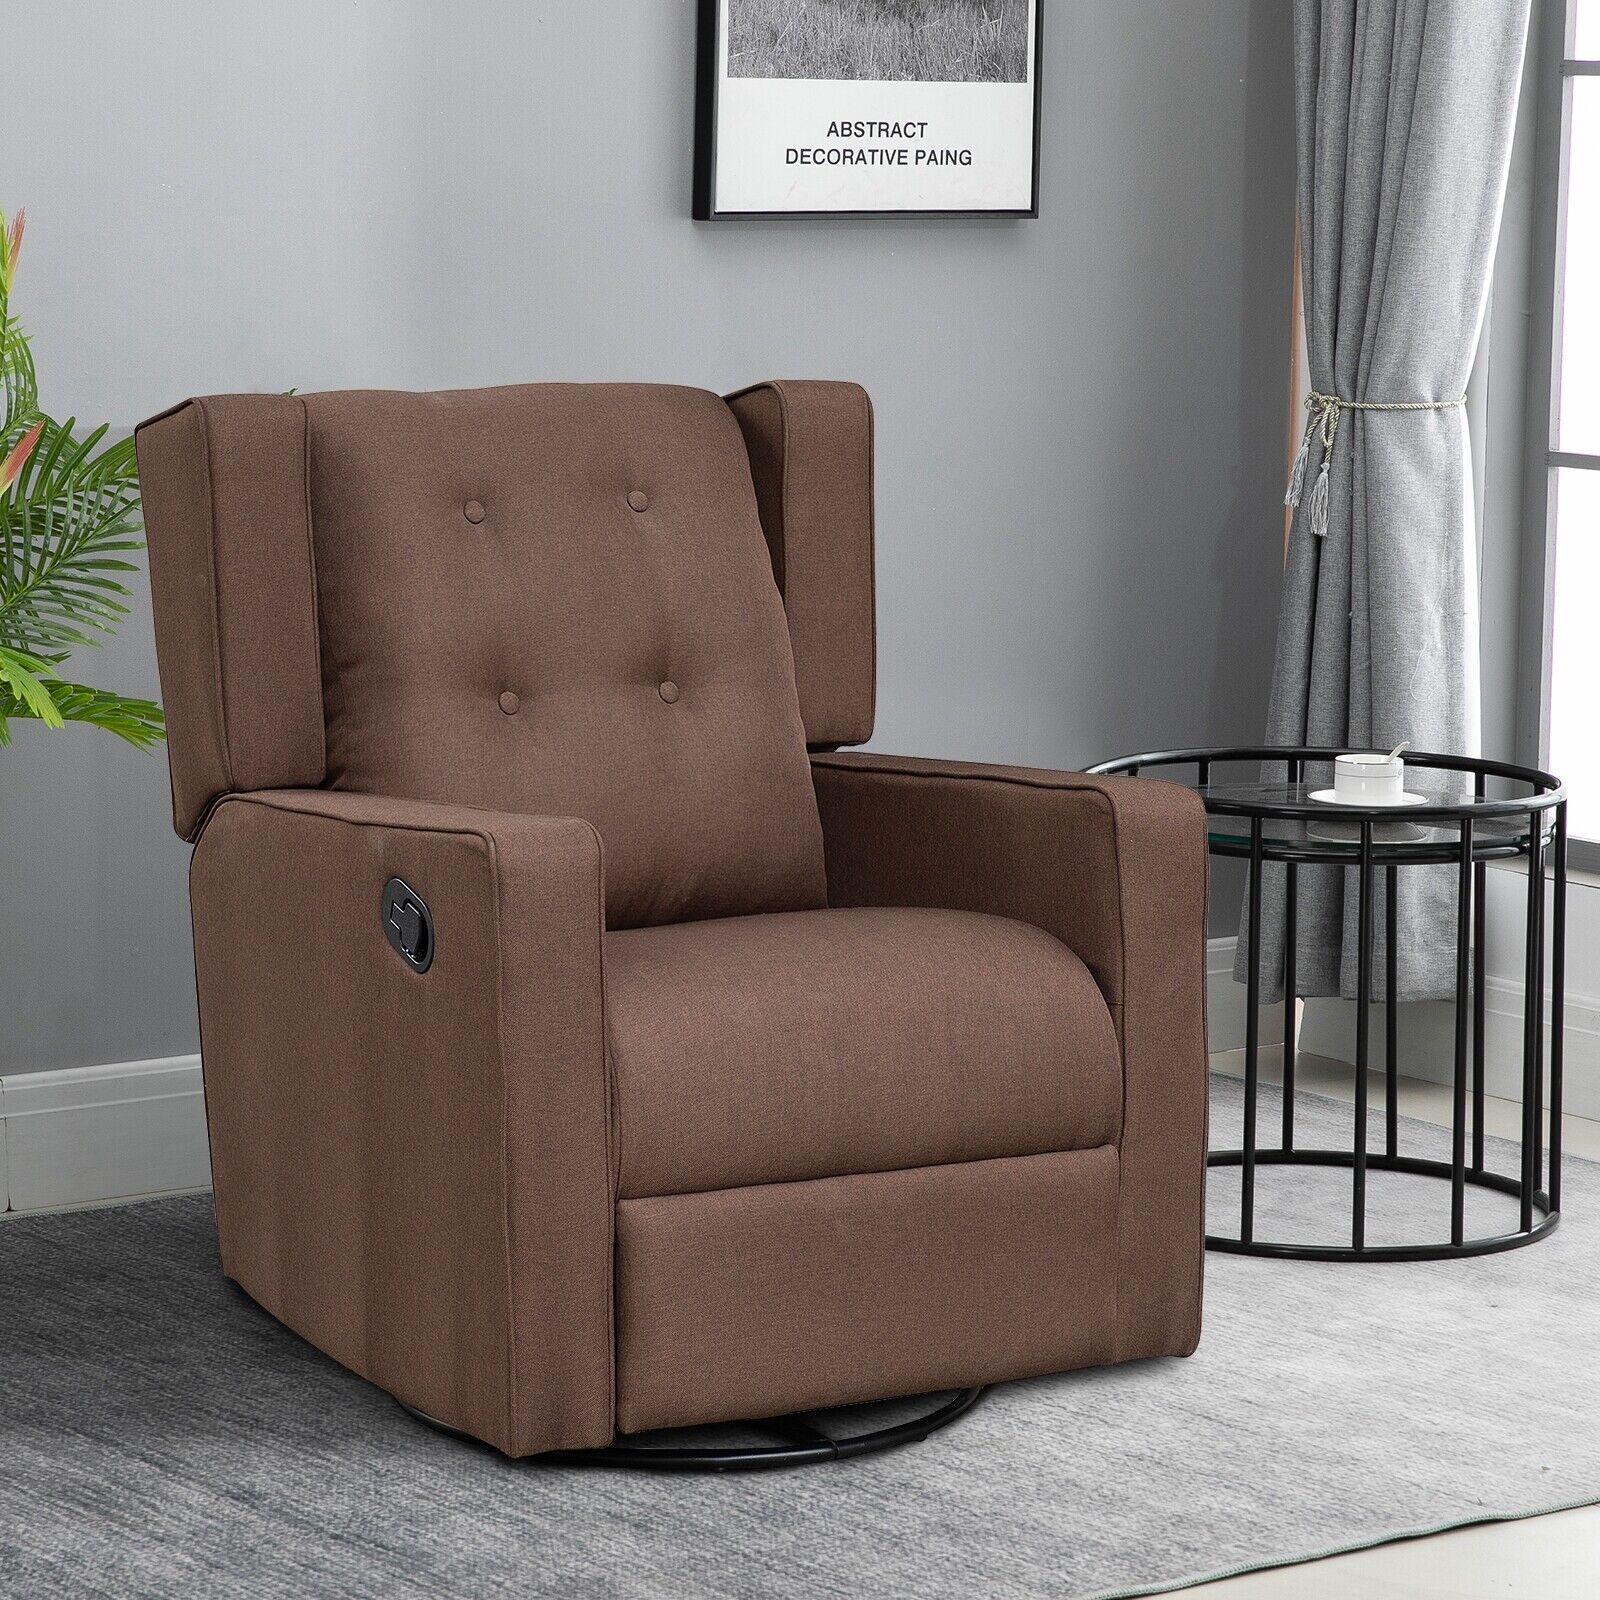 Polyester Linen Fabric Swivel Gliding Recliner Chair, Dark Brown